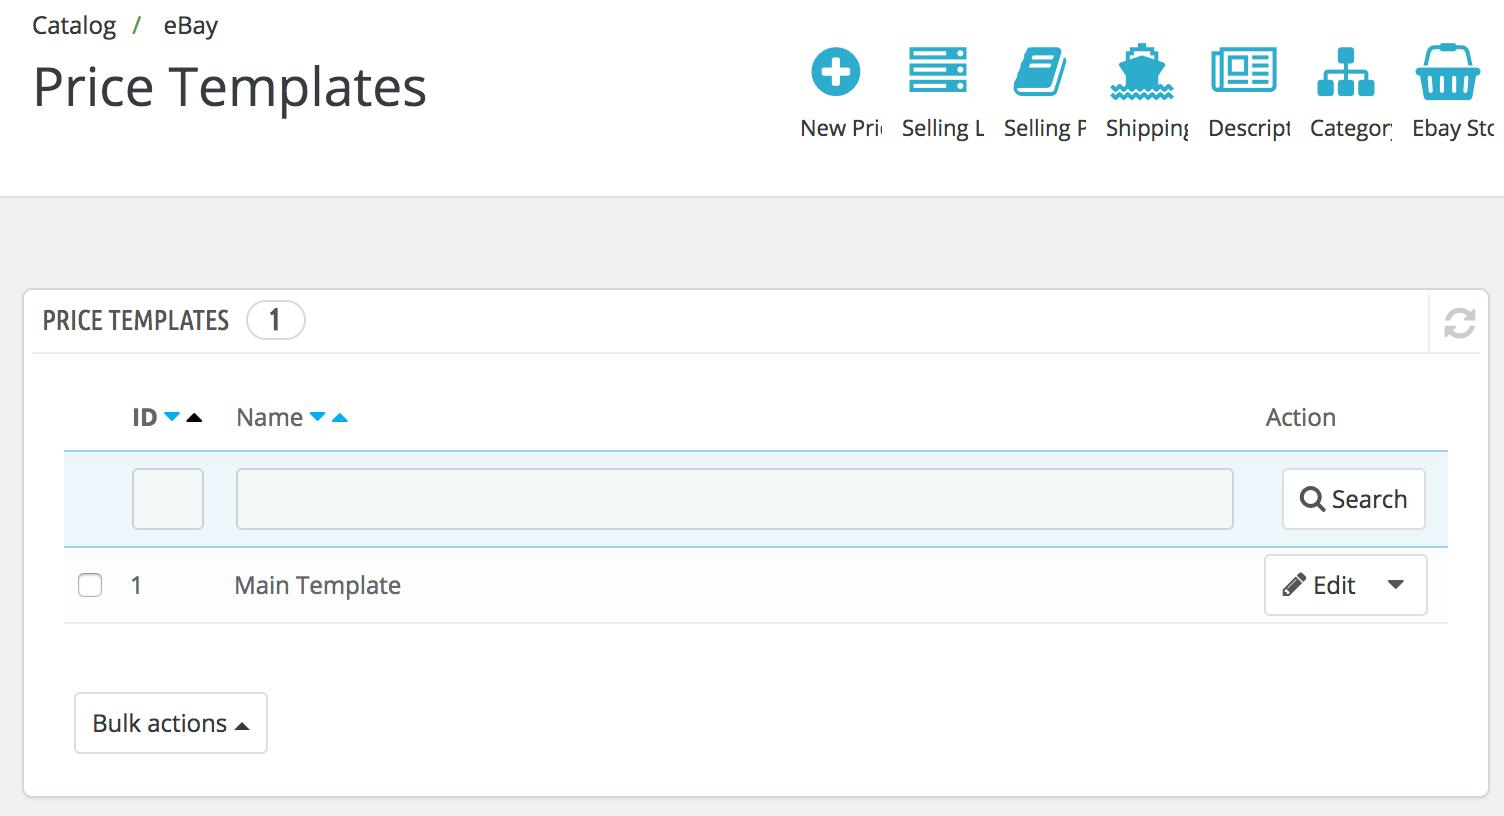 PrestaShop ebay module — Price Templates